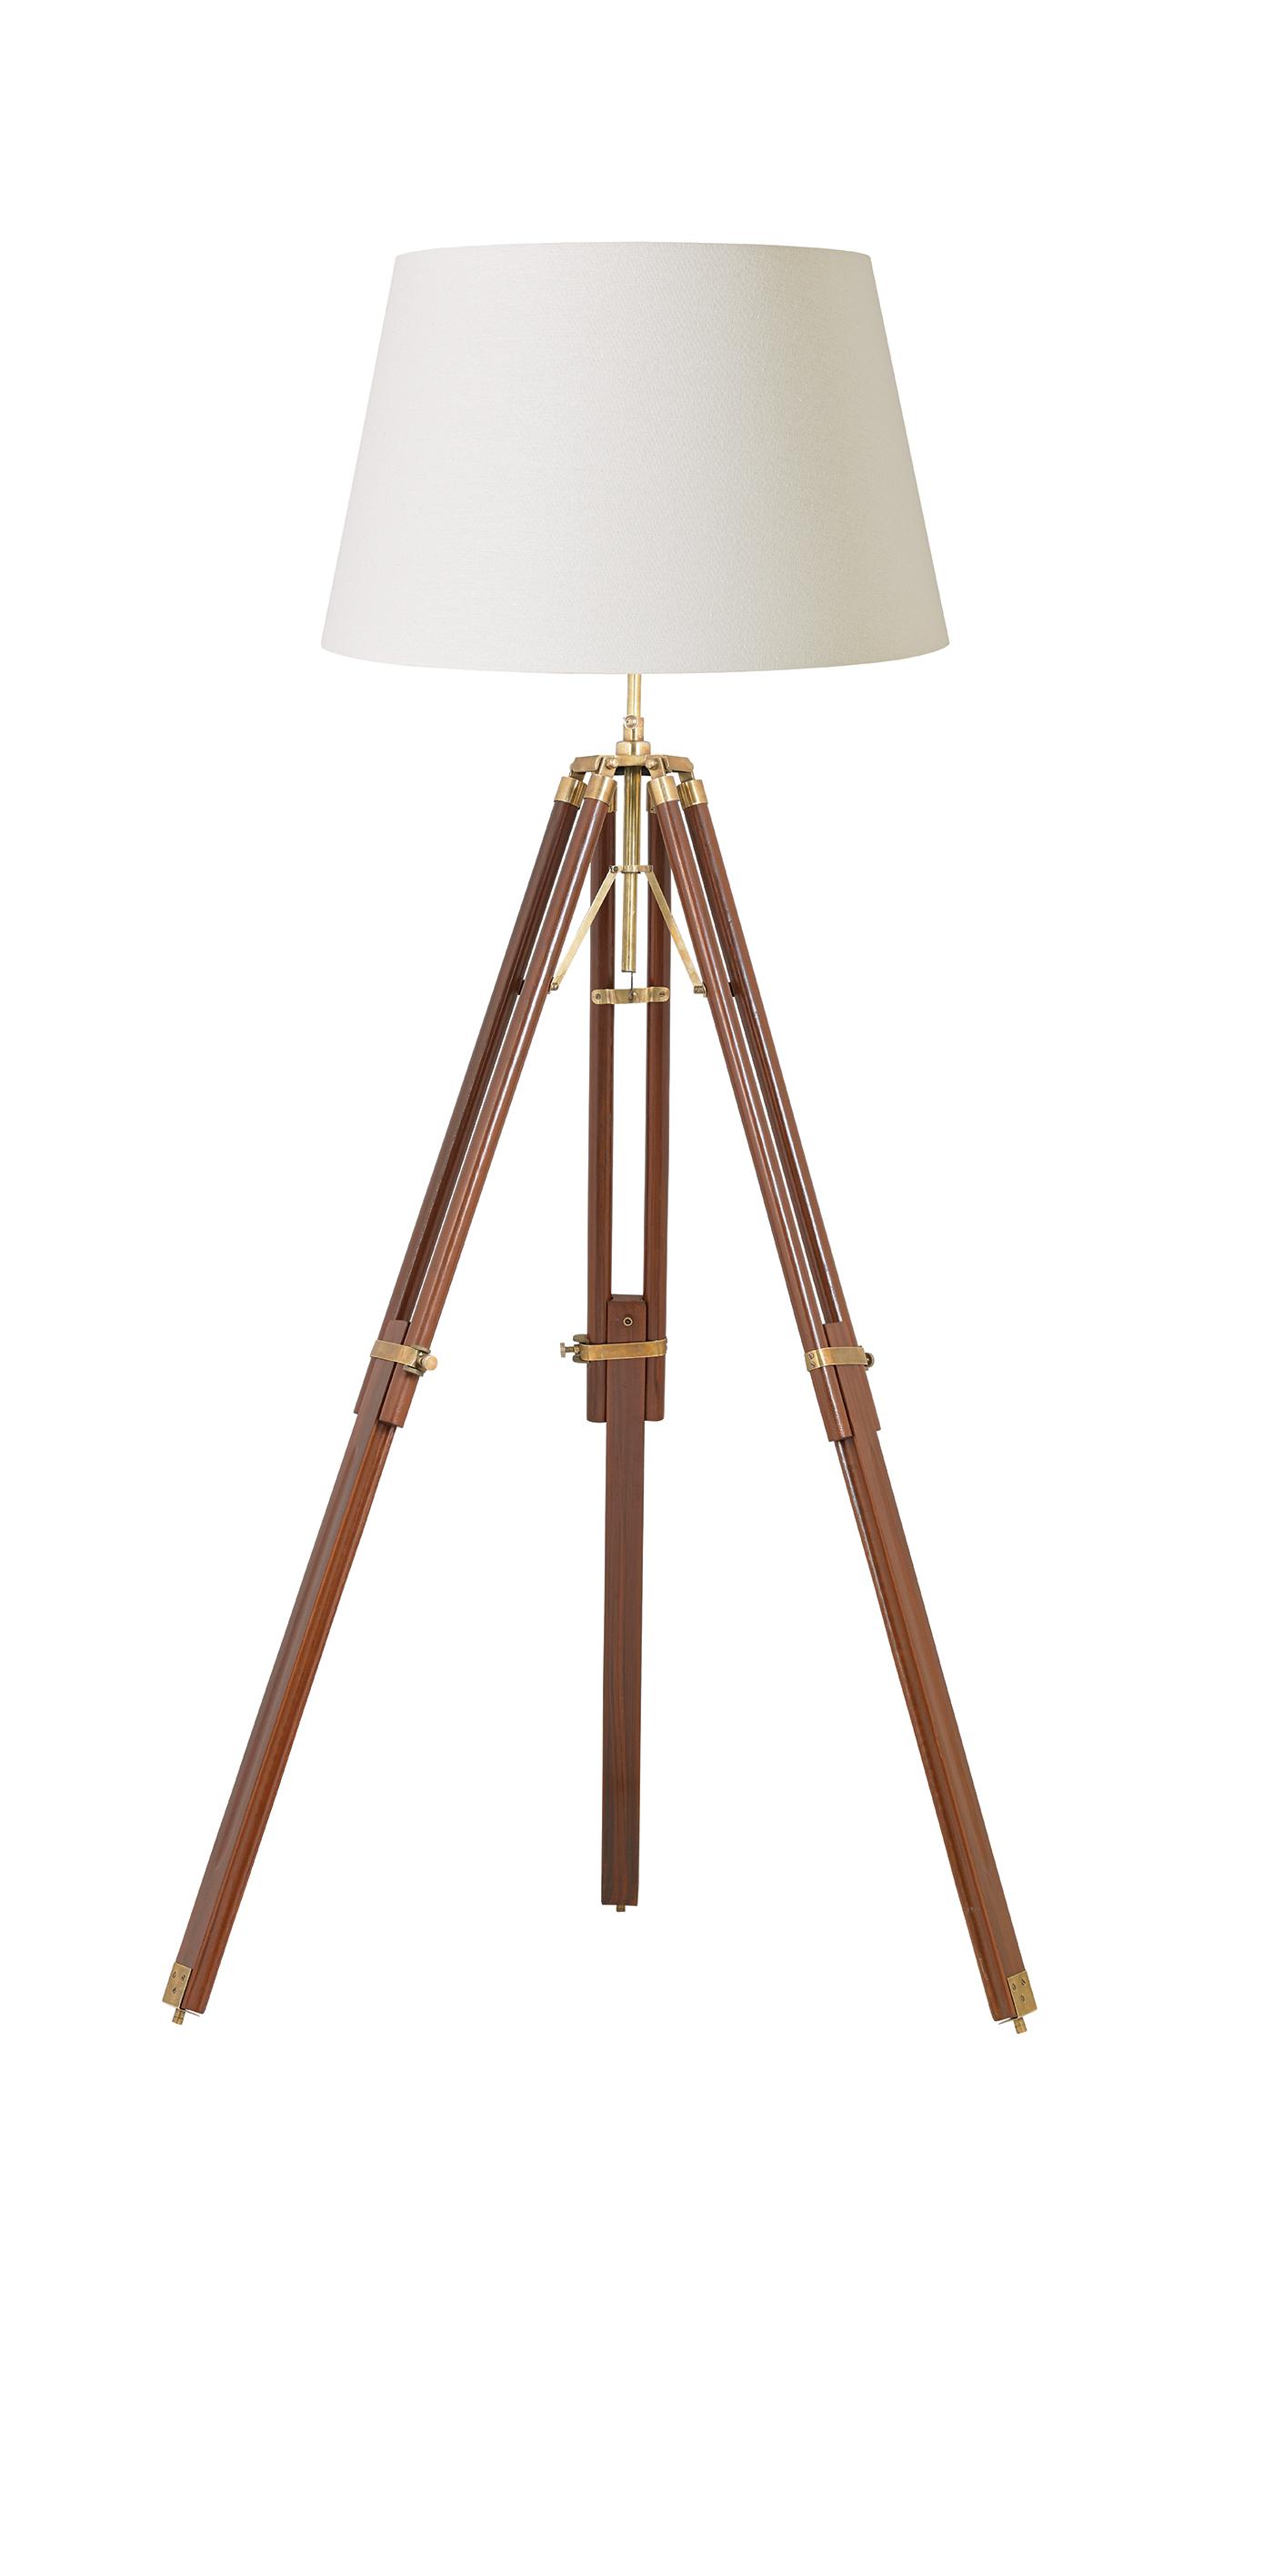 Endon tripod base only floor lamp 60w sheesham wood for Brass tripod floor lamp uk